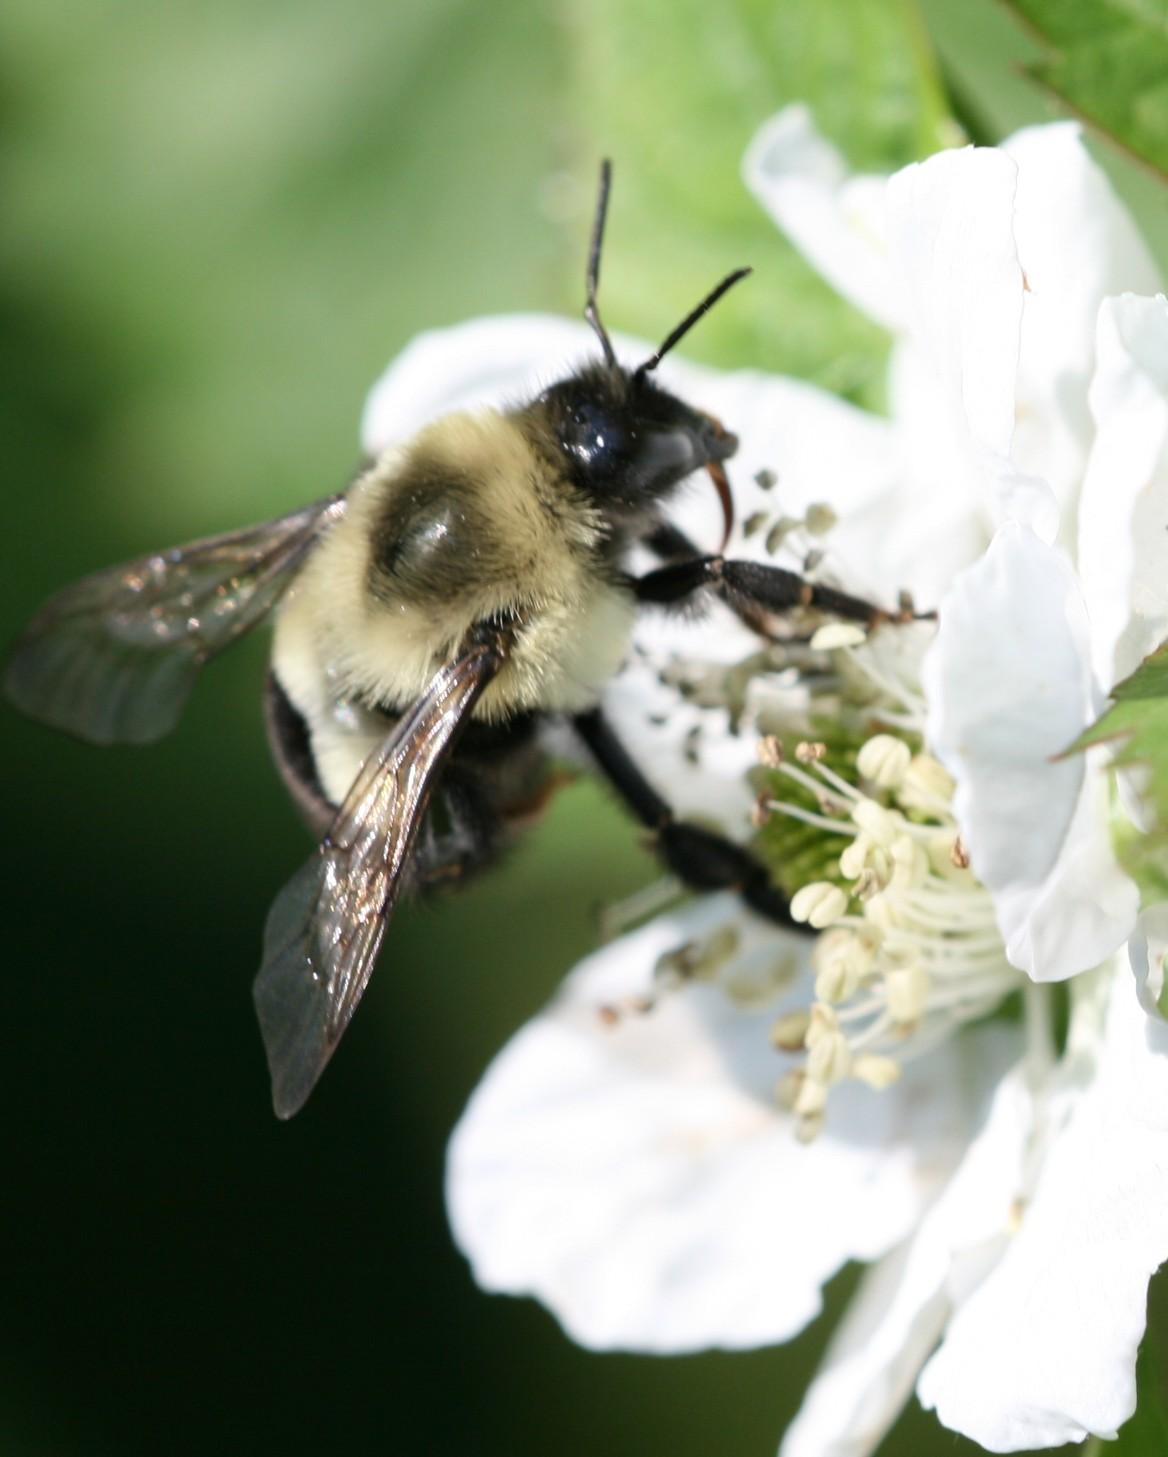 Bumble bee. Photo: Jeremy Slone